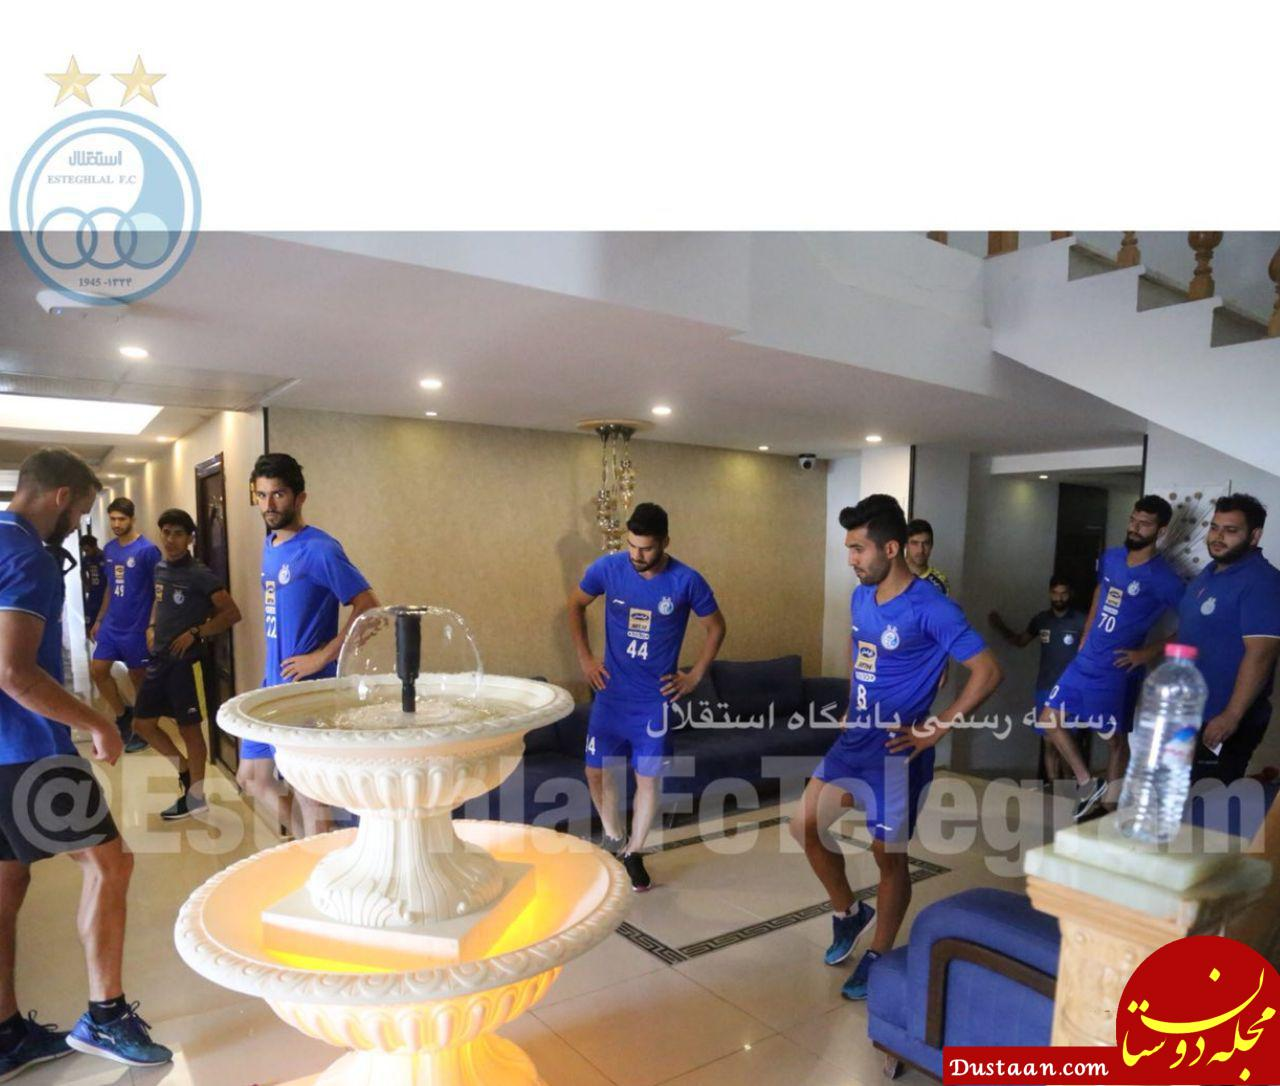 www.dustaan.com نویمایر:برای بازی 90 دقیقه ای هم مشکلی ندارم